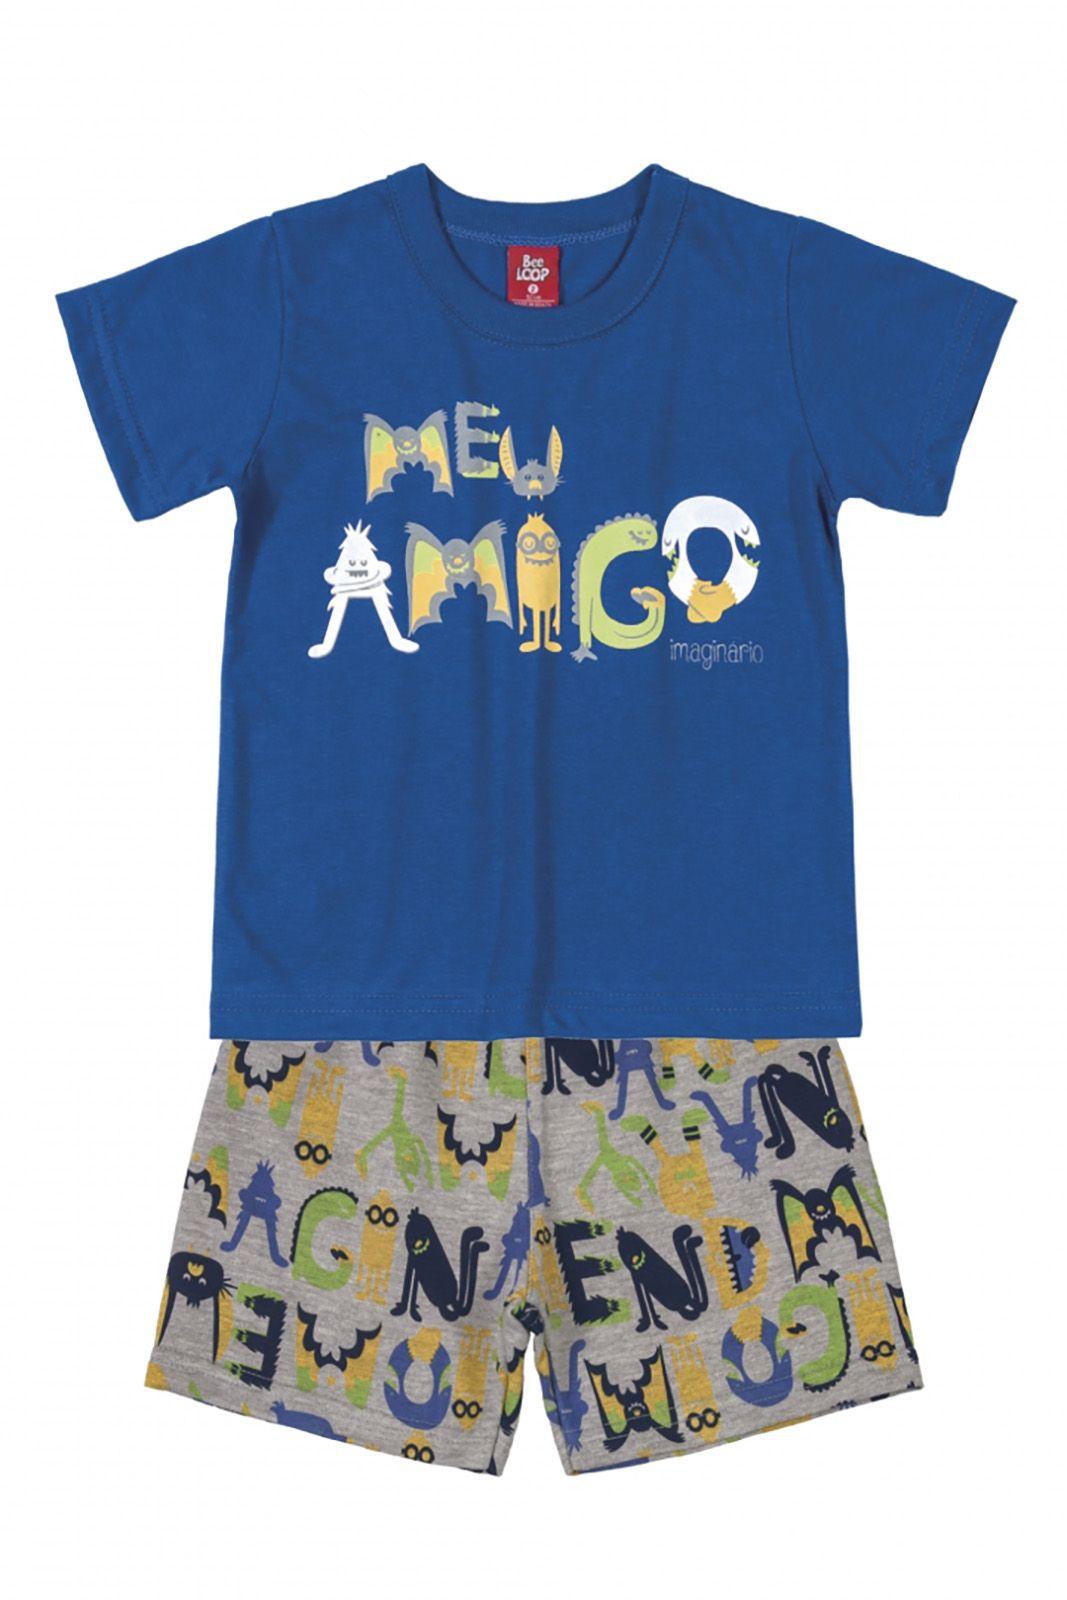 Conjunto Infantil Camiseta e Bermuda Moletinho Bee Loop Meu Amigo Azul / Mescla